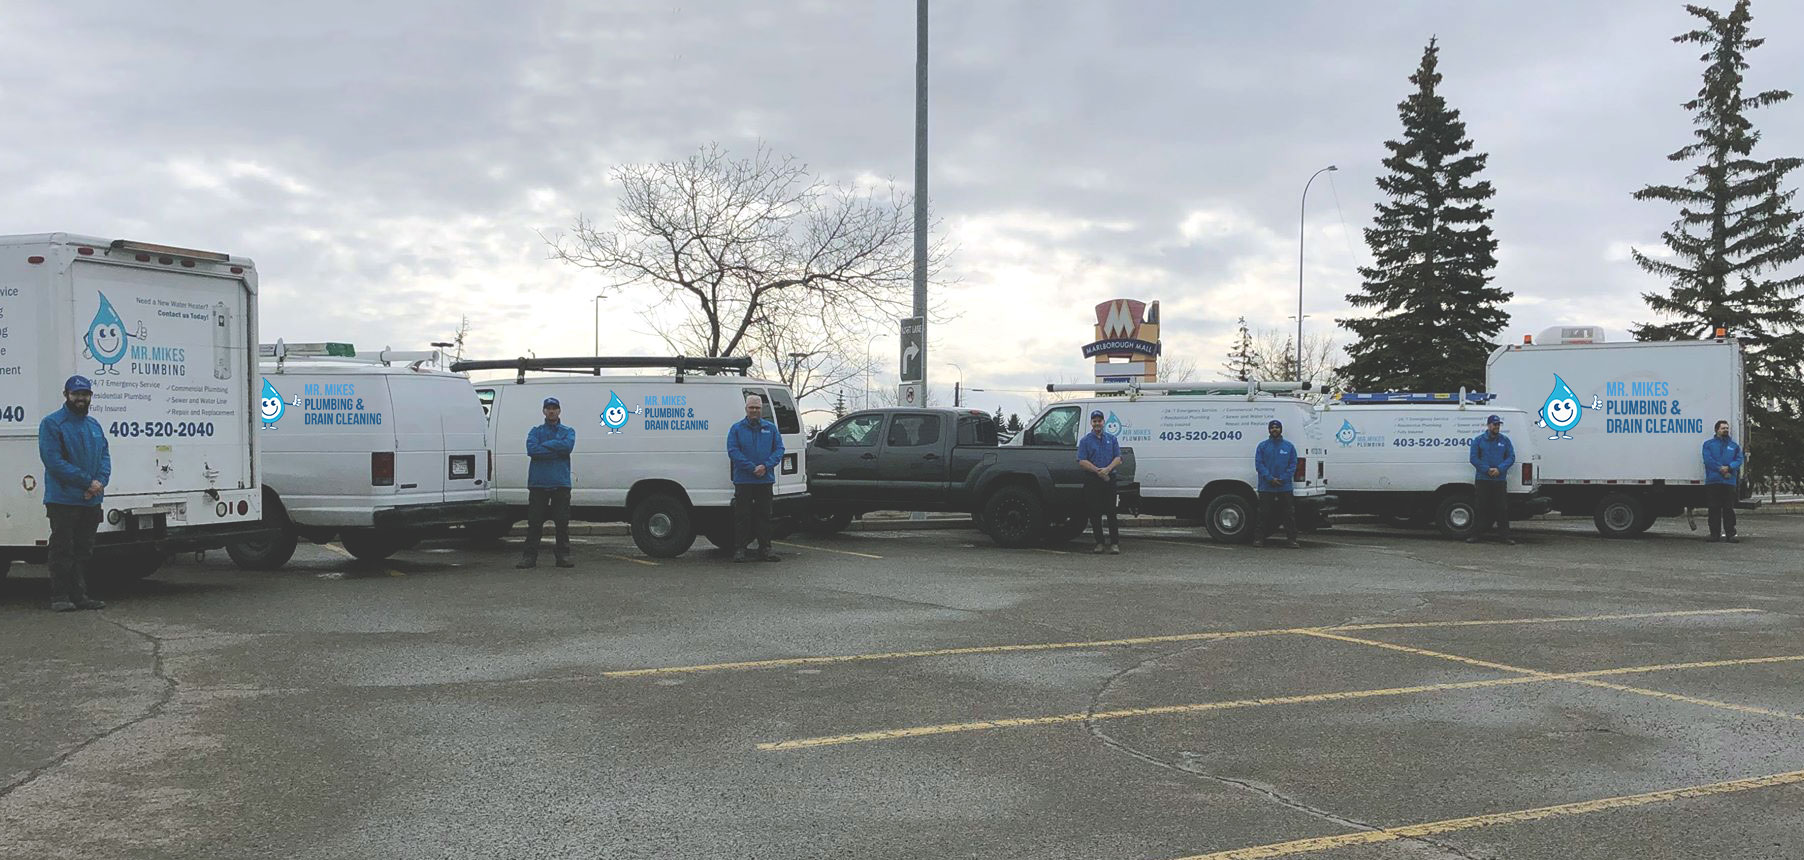 Mr. Mikes Plumbing & Drain Cleaning Calgary